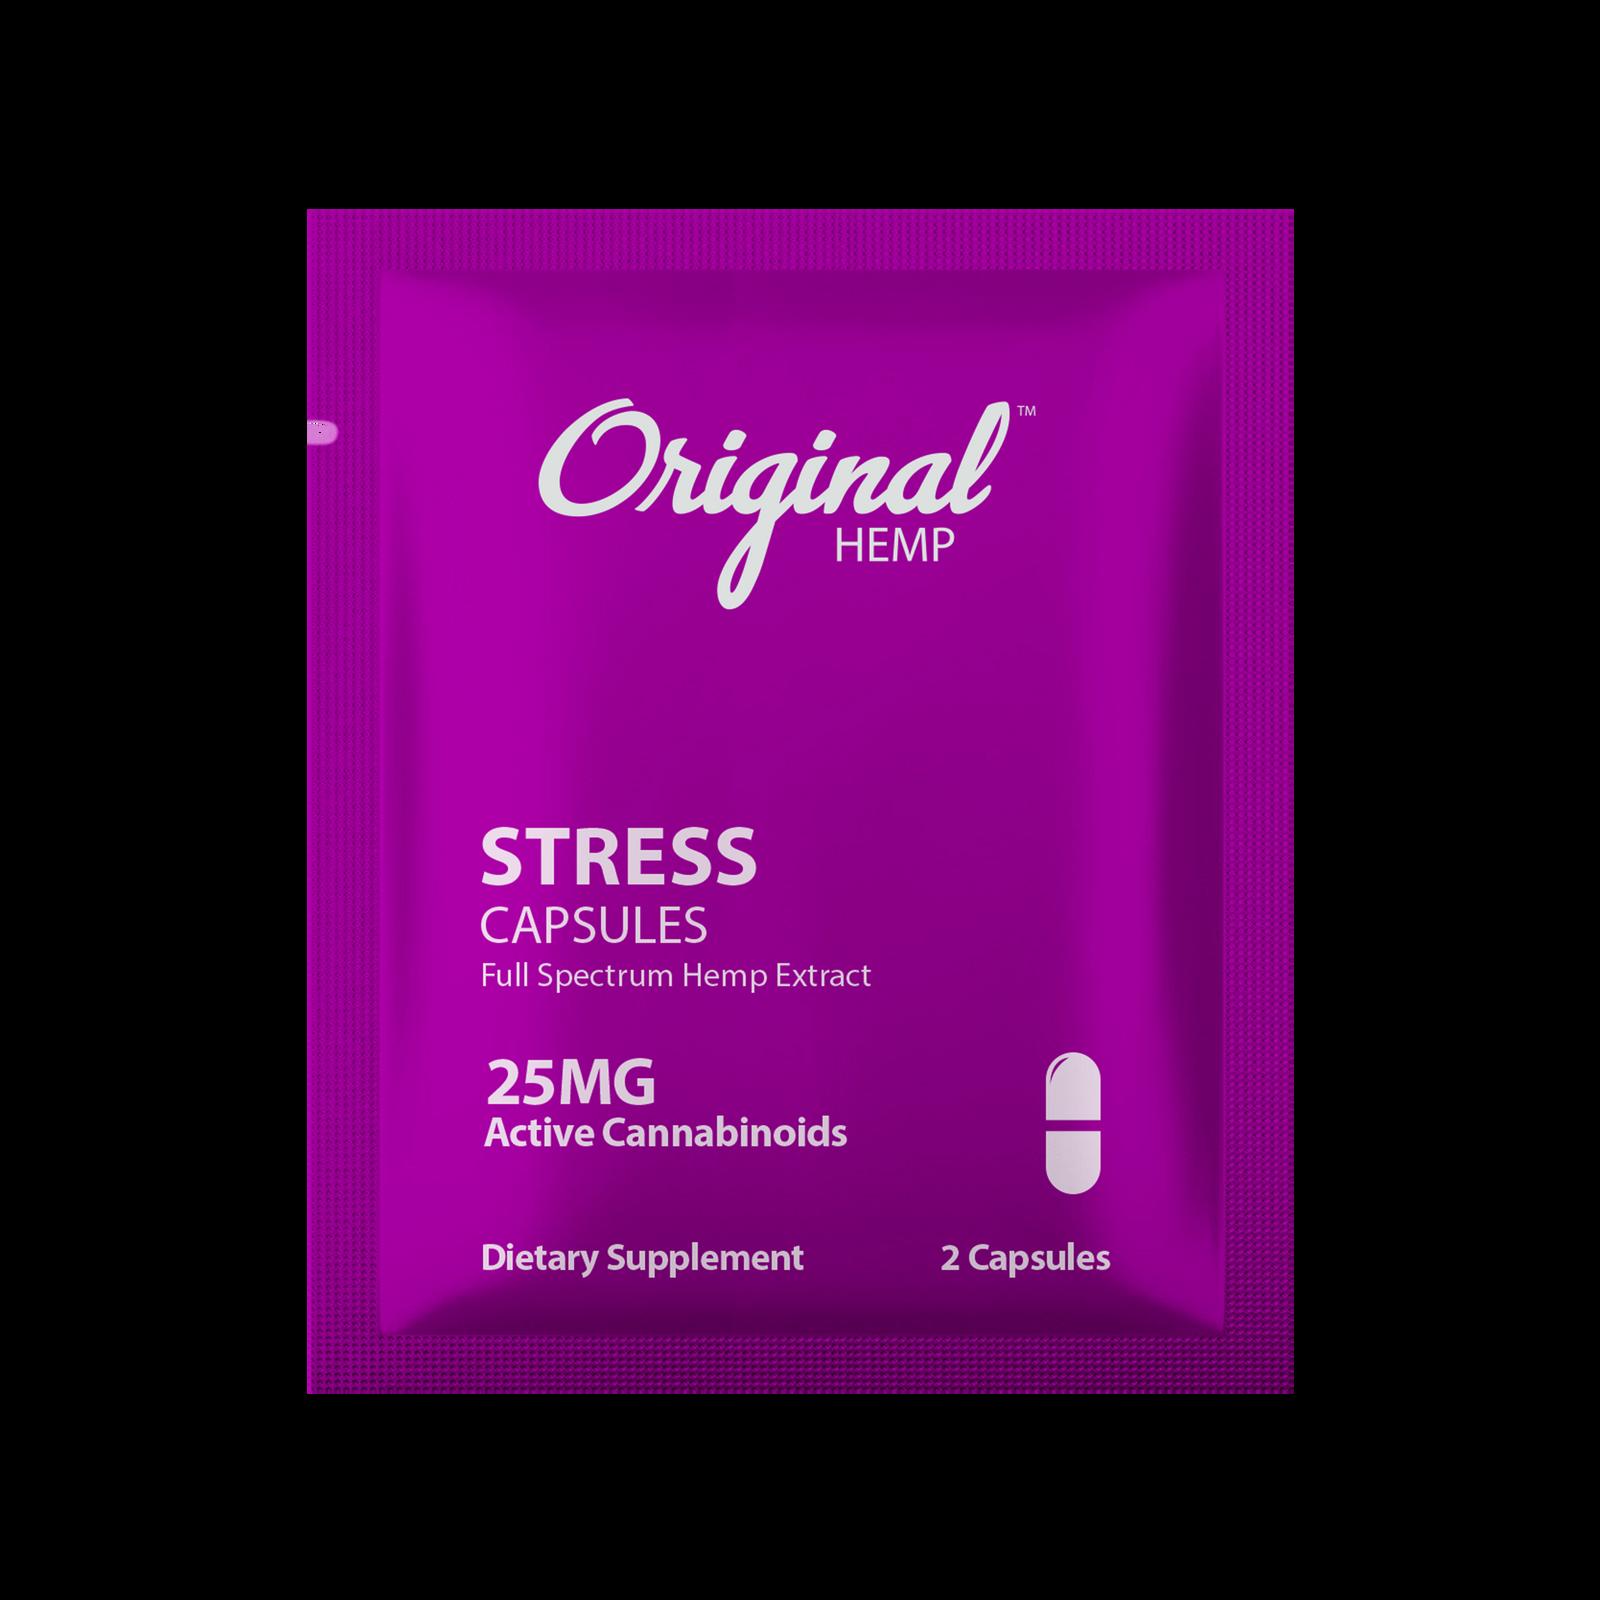 Original Hemp Stress Daily Dose Capsules - 25 mg